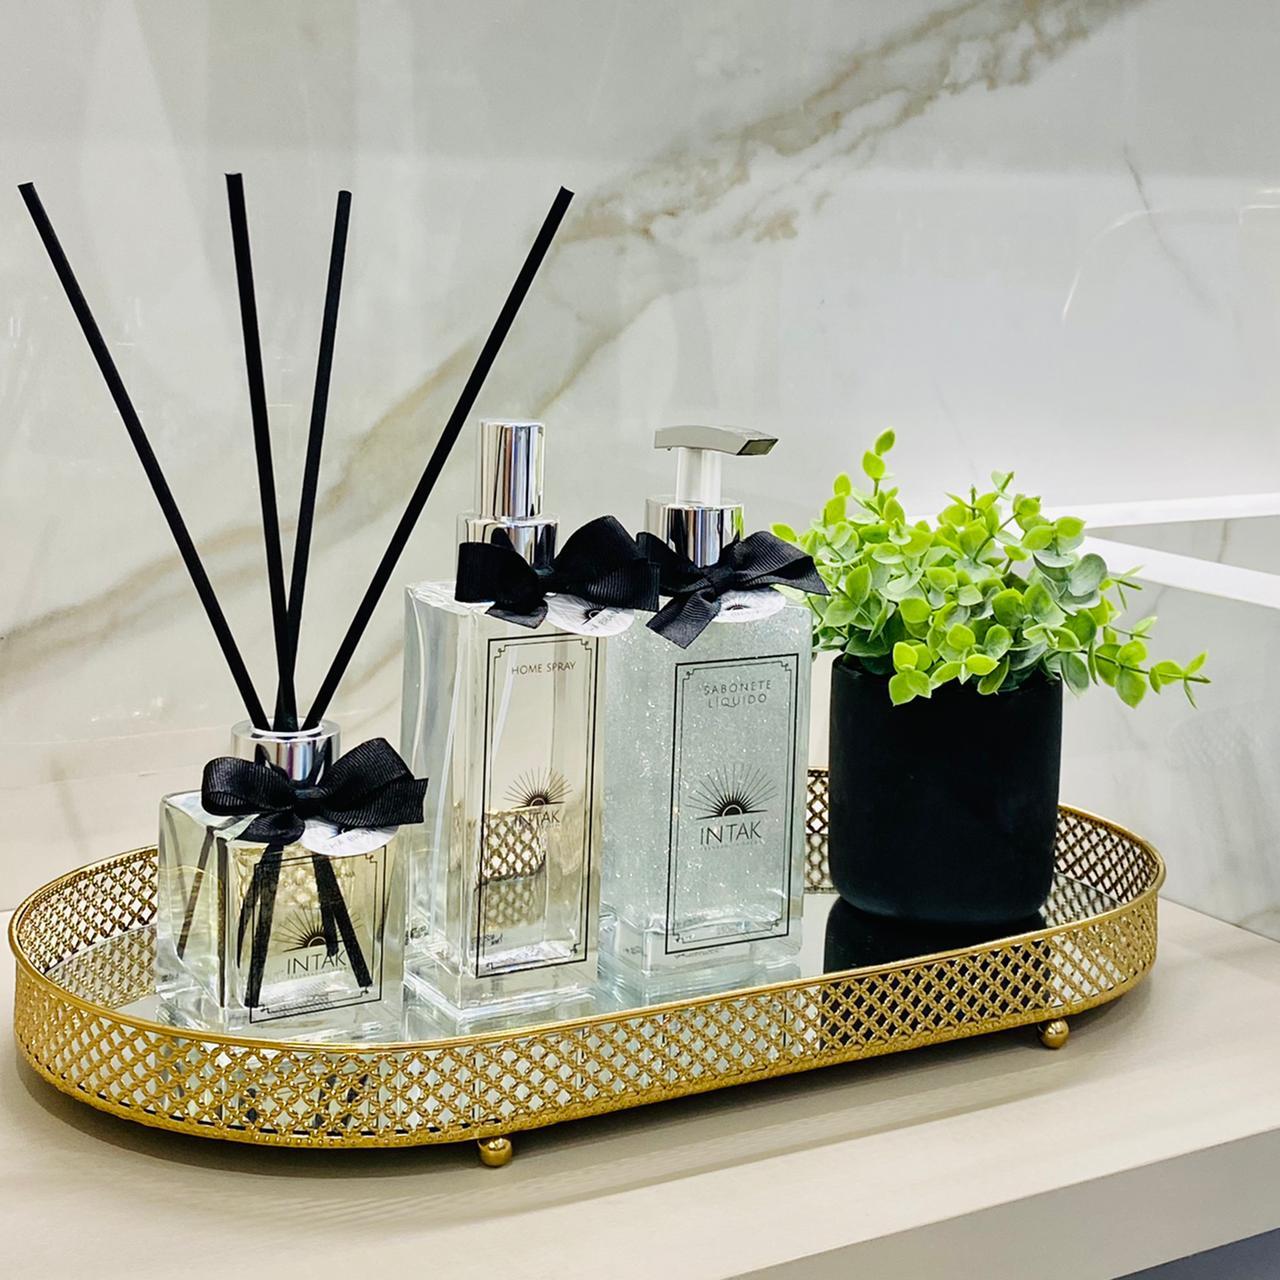 Kit Lavabo Bandeja Oval Dourada M com Vaso - Chá Branco